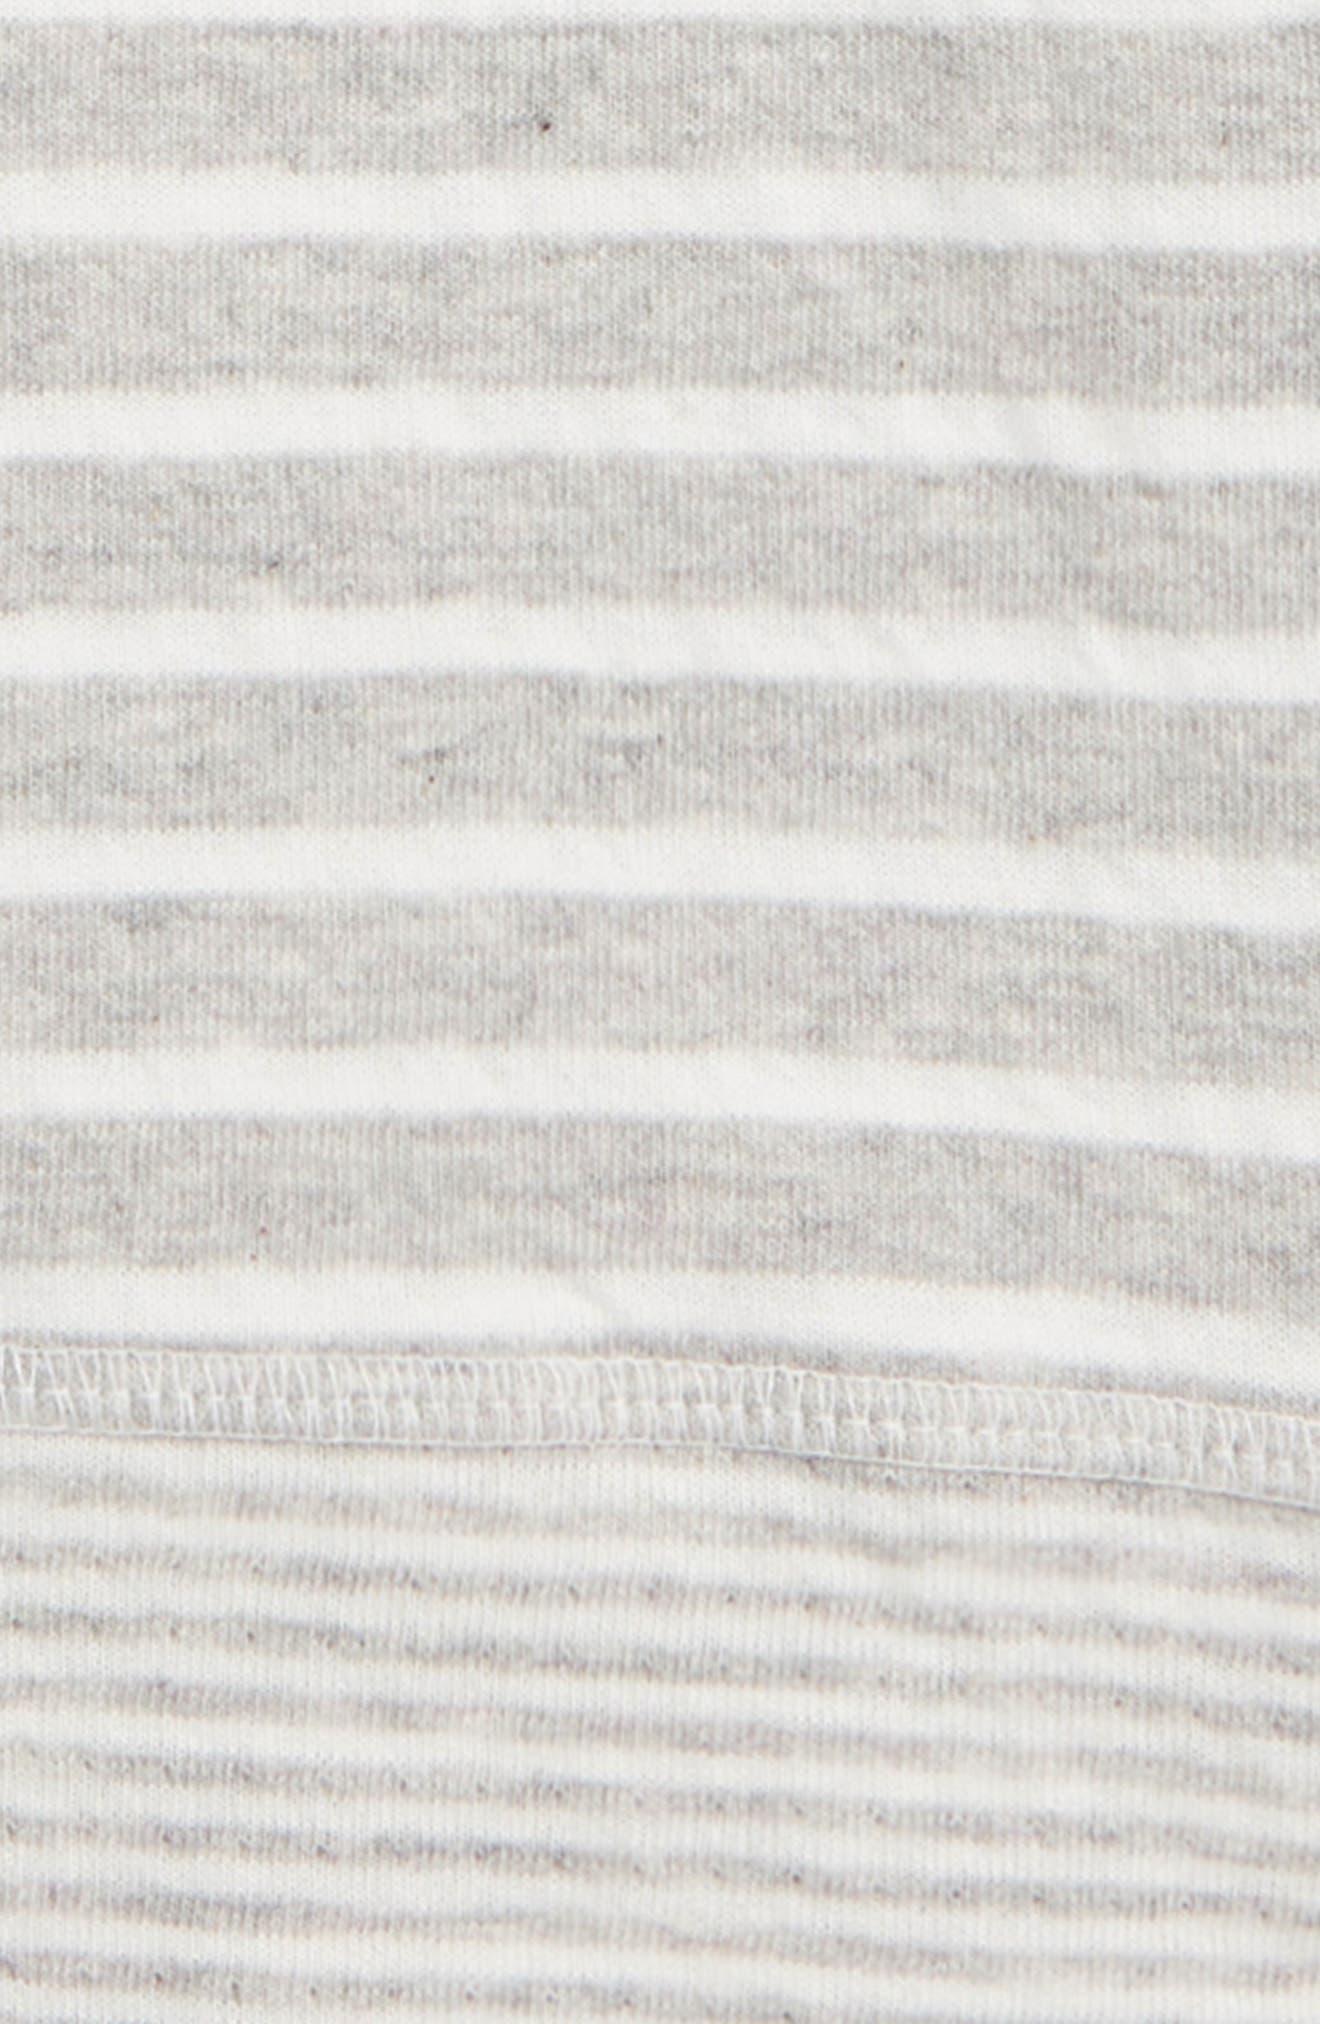 Double Layer Reversible T-Shirt,                             Alternate thumbnail 3, color,                             GREY MARL/ ECRU